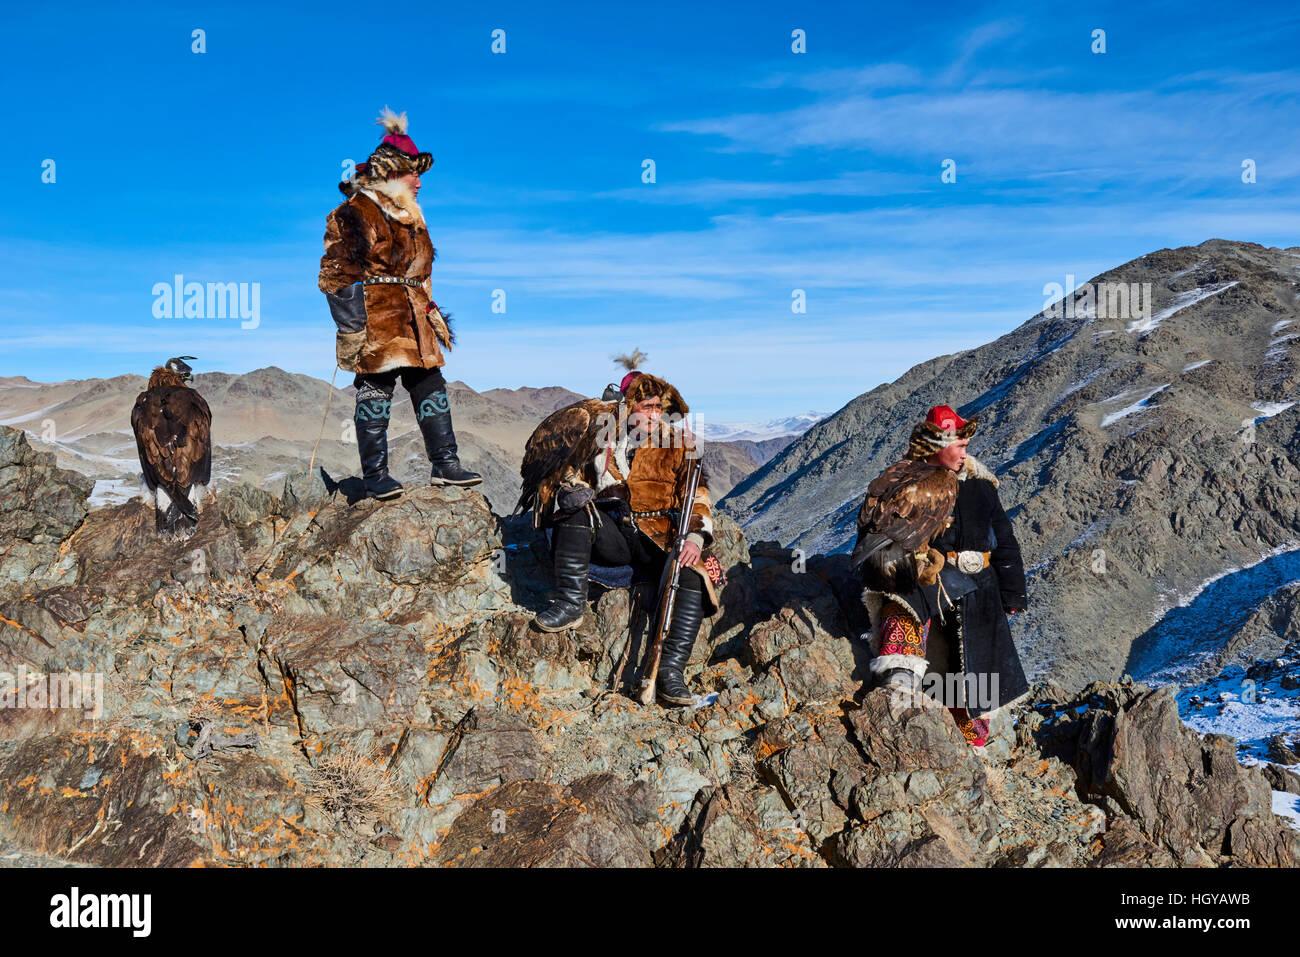 Mongolia, Bayan Olgii, kazakh eagle hunter, Eagle hunting, golden eagle Stock Photo